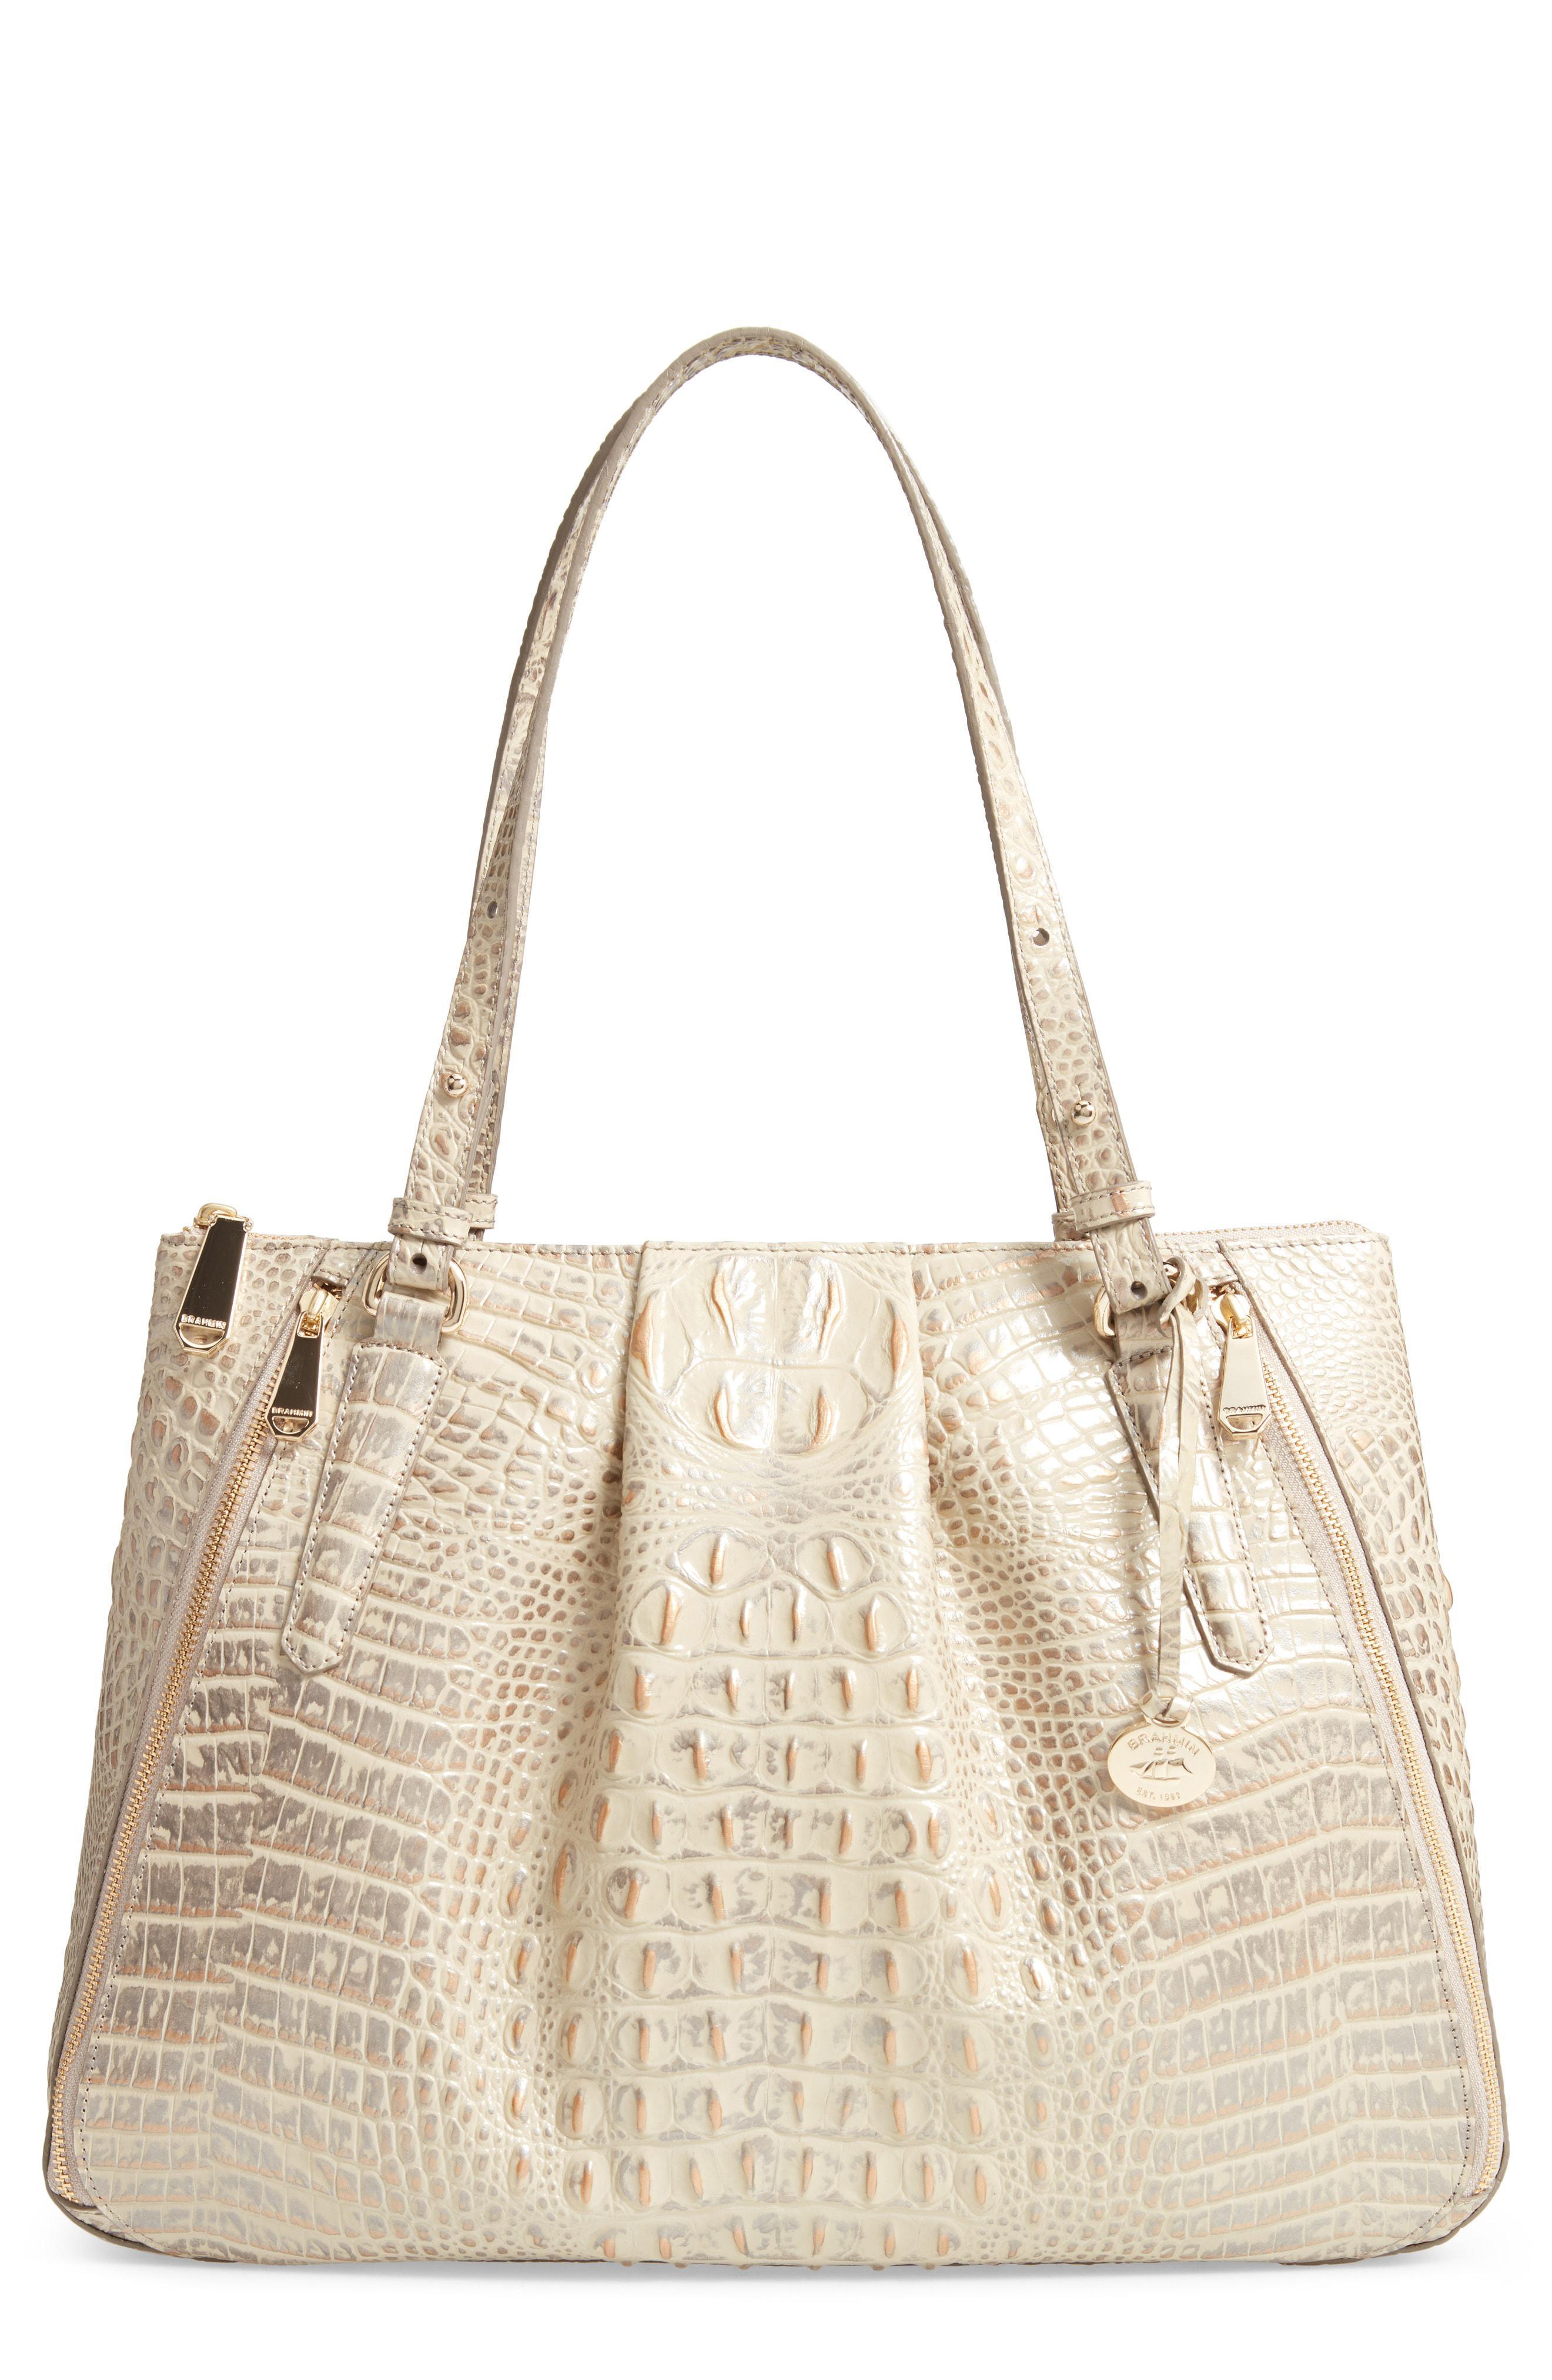 4e944eef4 Brahmin Melbourne - Adina Croc Embossed Leather Satchel in White - Lyst